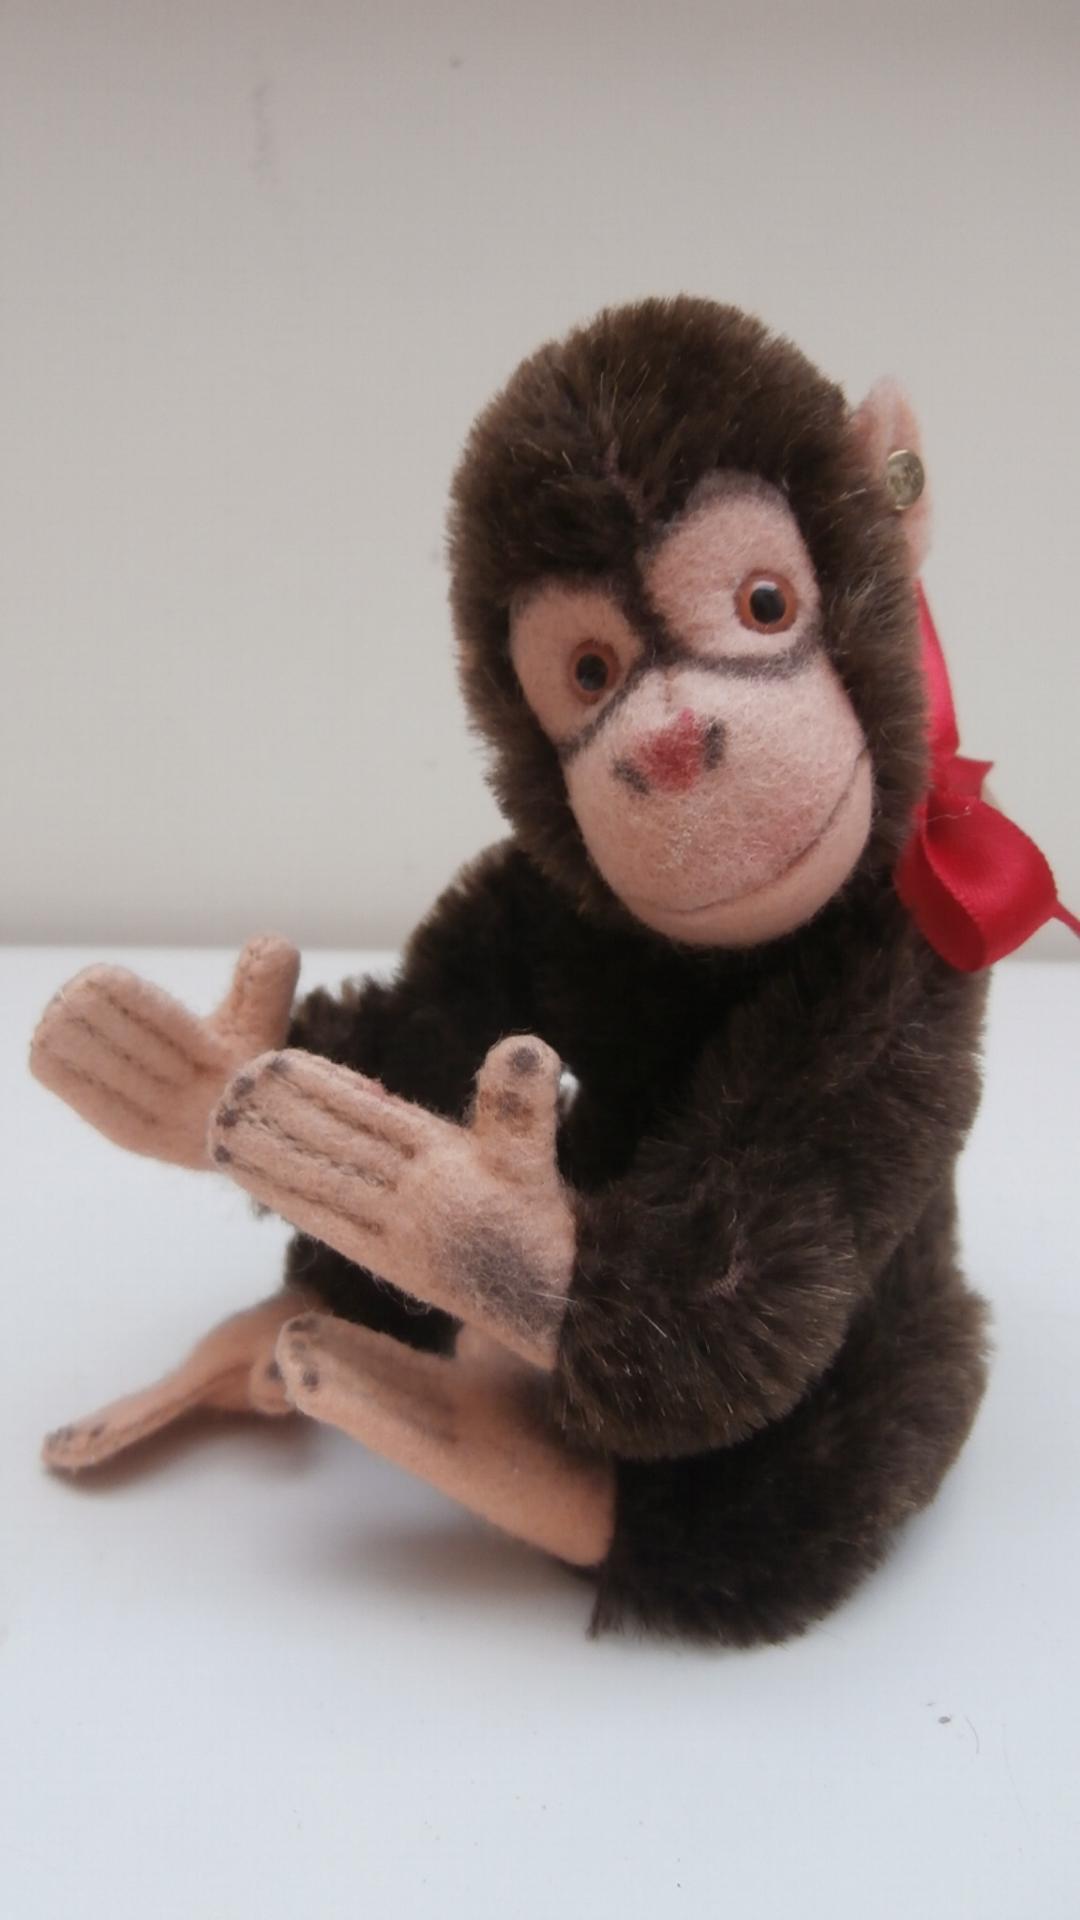 Steiff Jocko Flexible Monkey 1978 to 1980, Gold Steiff Button.